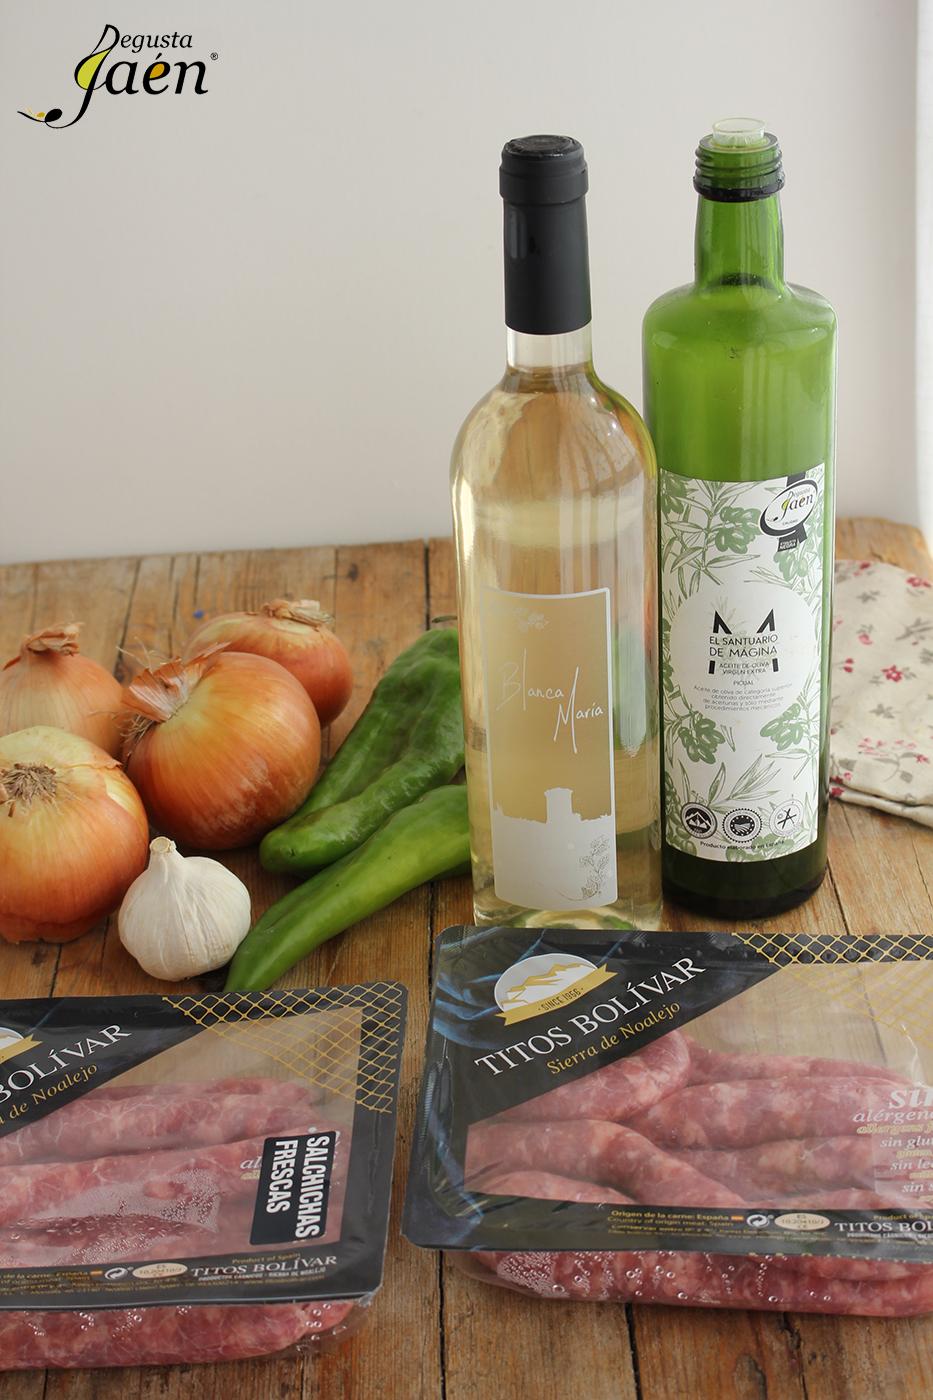 Ingredientes Salchichas vino blanco Degusta Jaen